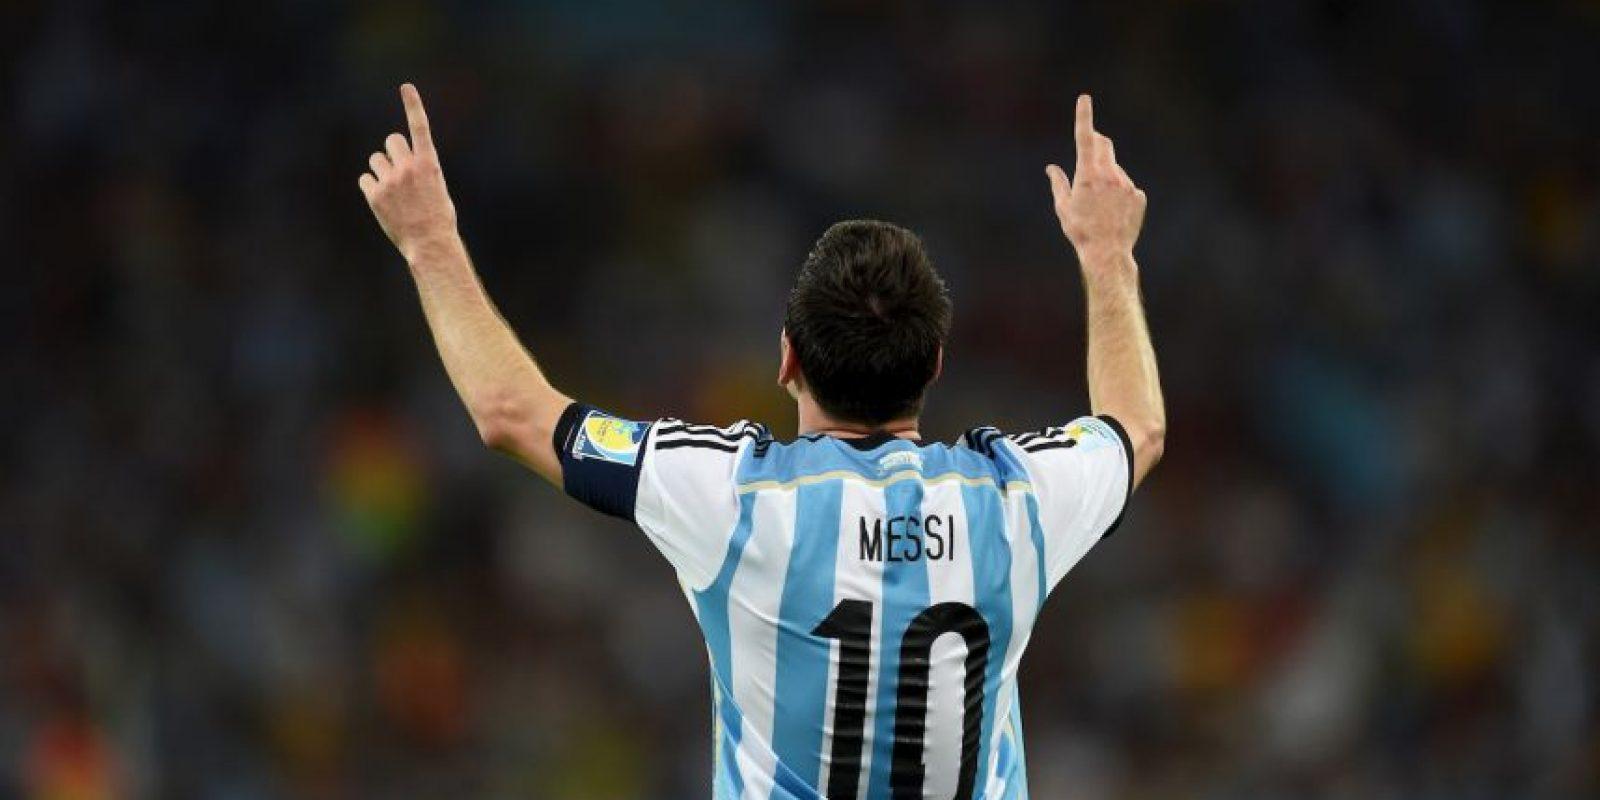 Lionel Messi / Futbolista Foto:Getty Images